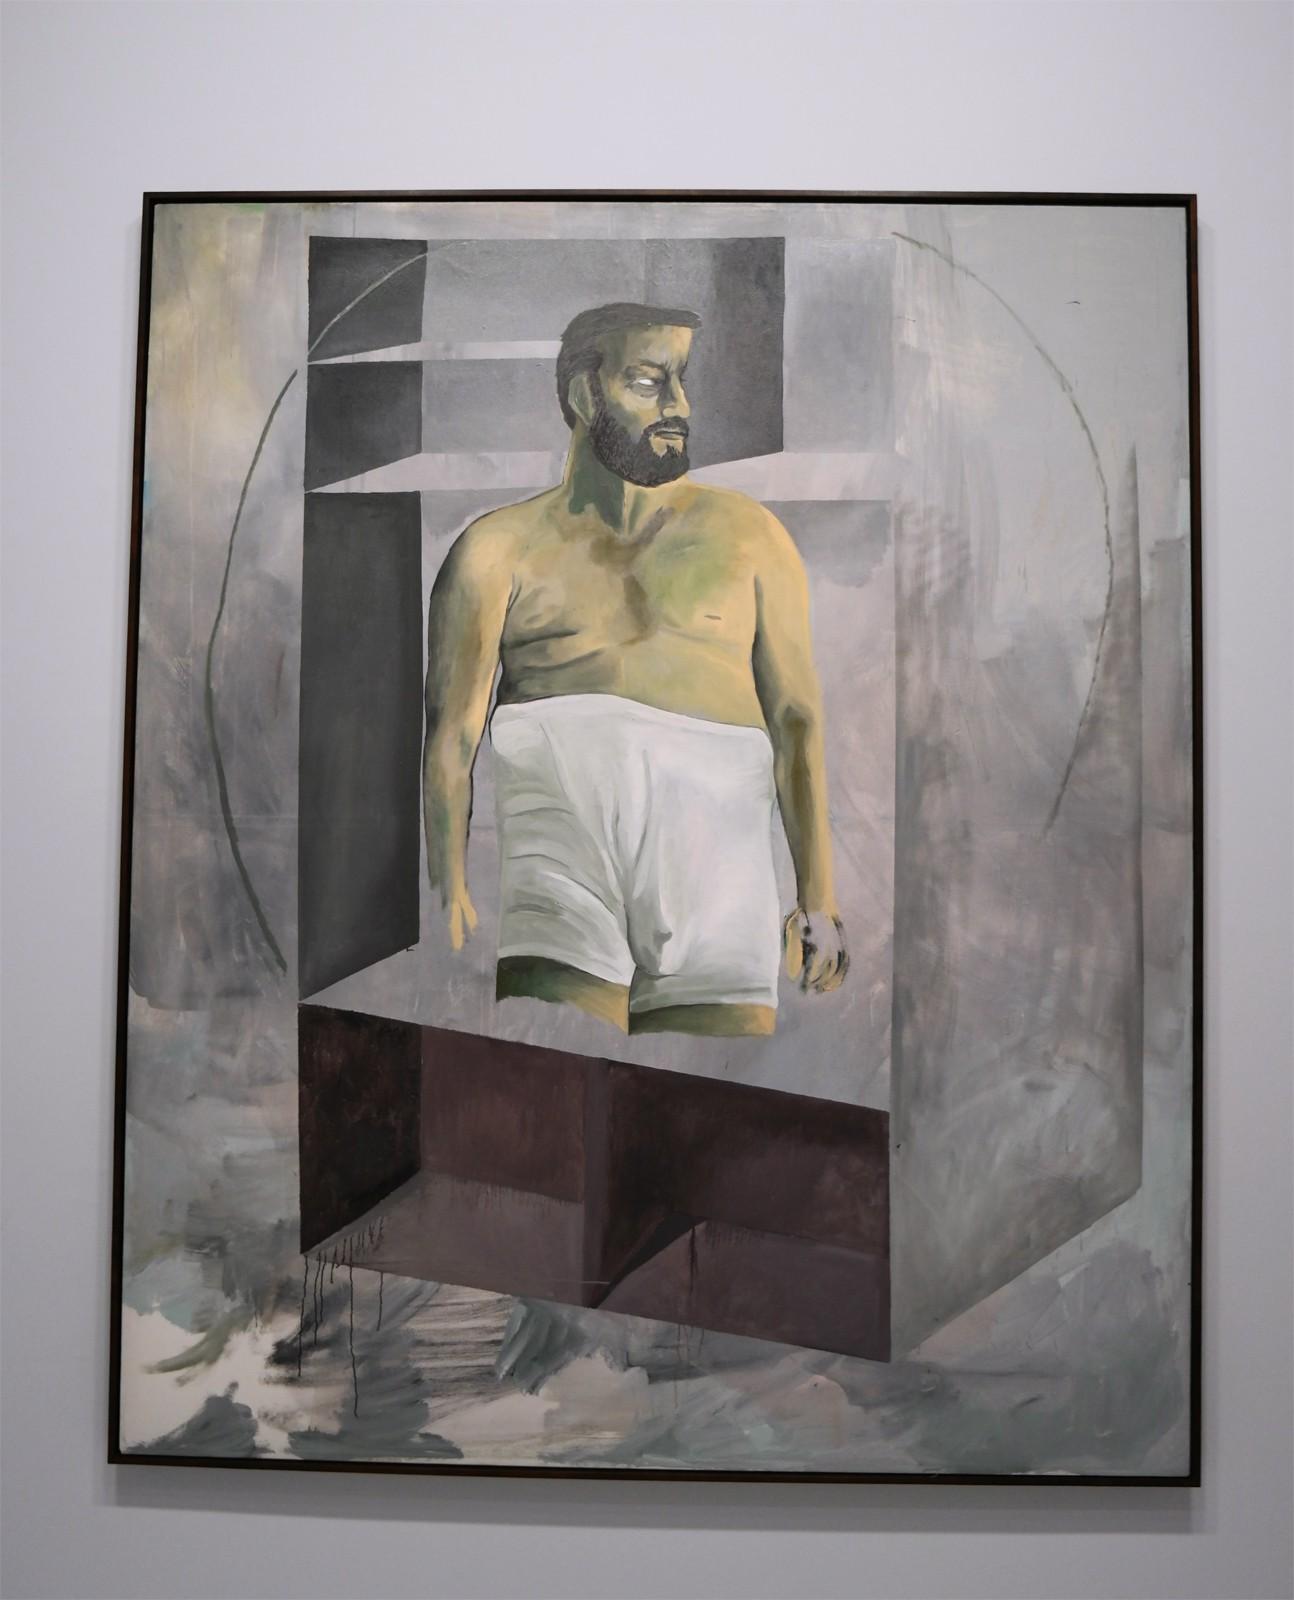 Ohne Titel (sans titre), 1988, Martin Kippenberger